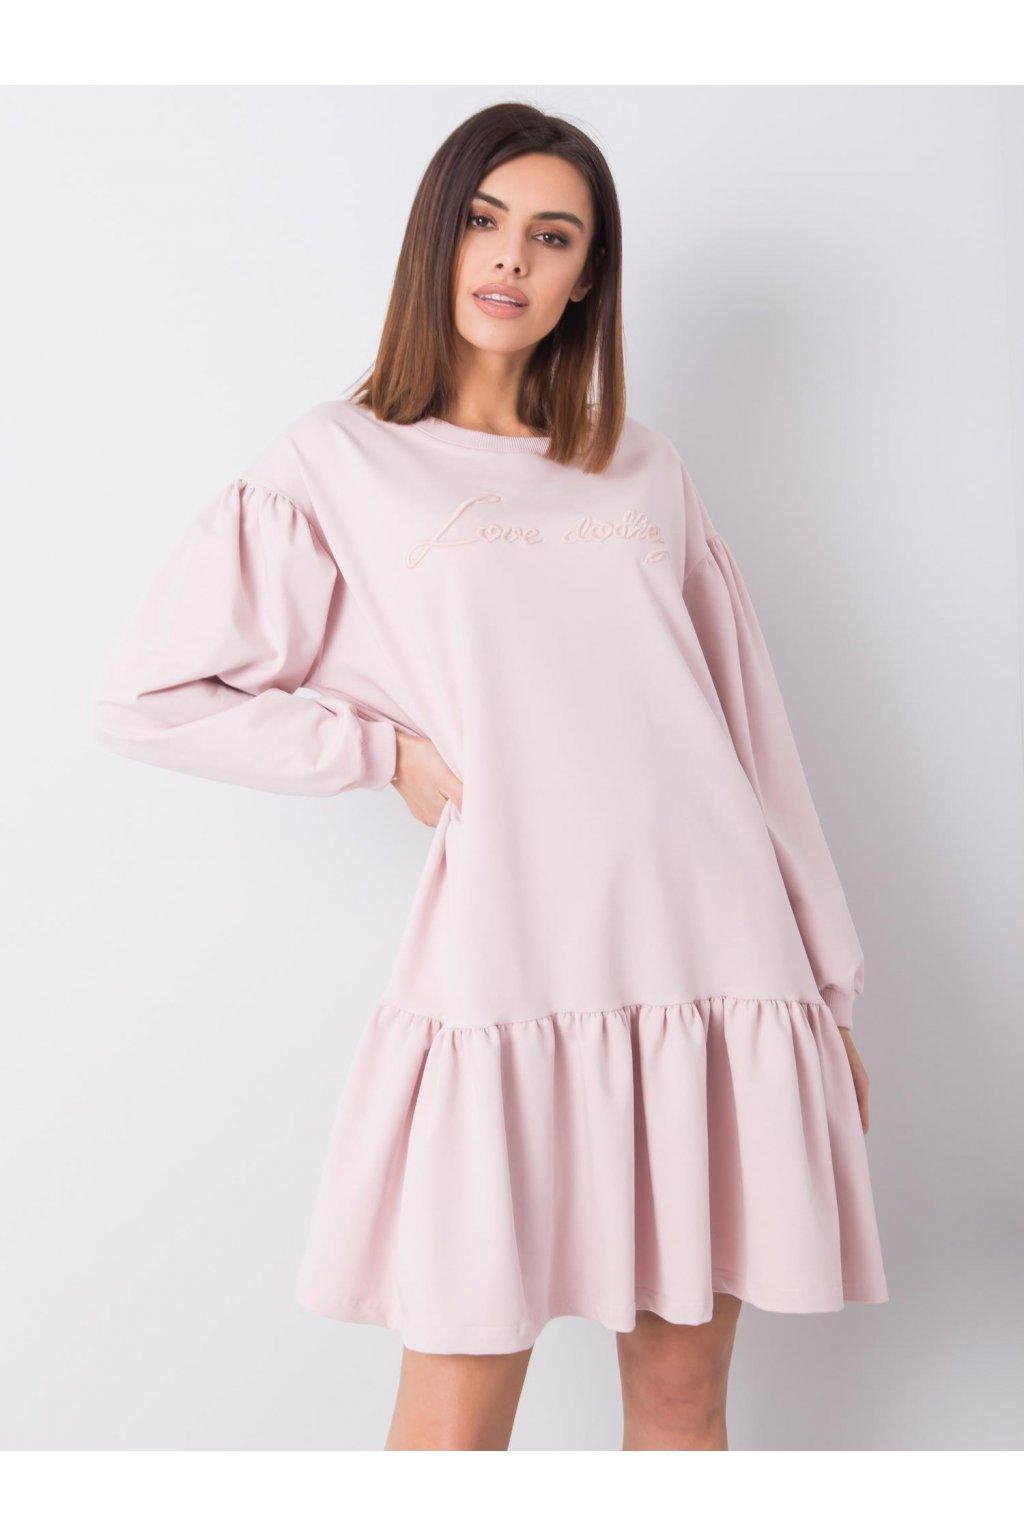 pol pl Brudnorozowa sukienka z falbana Janelle 363382 1